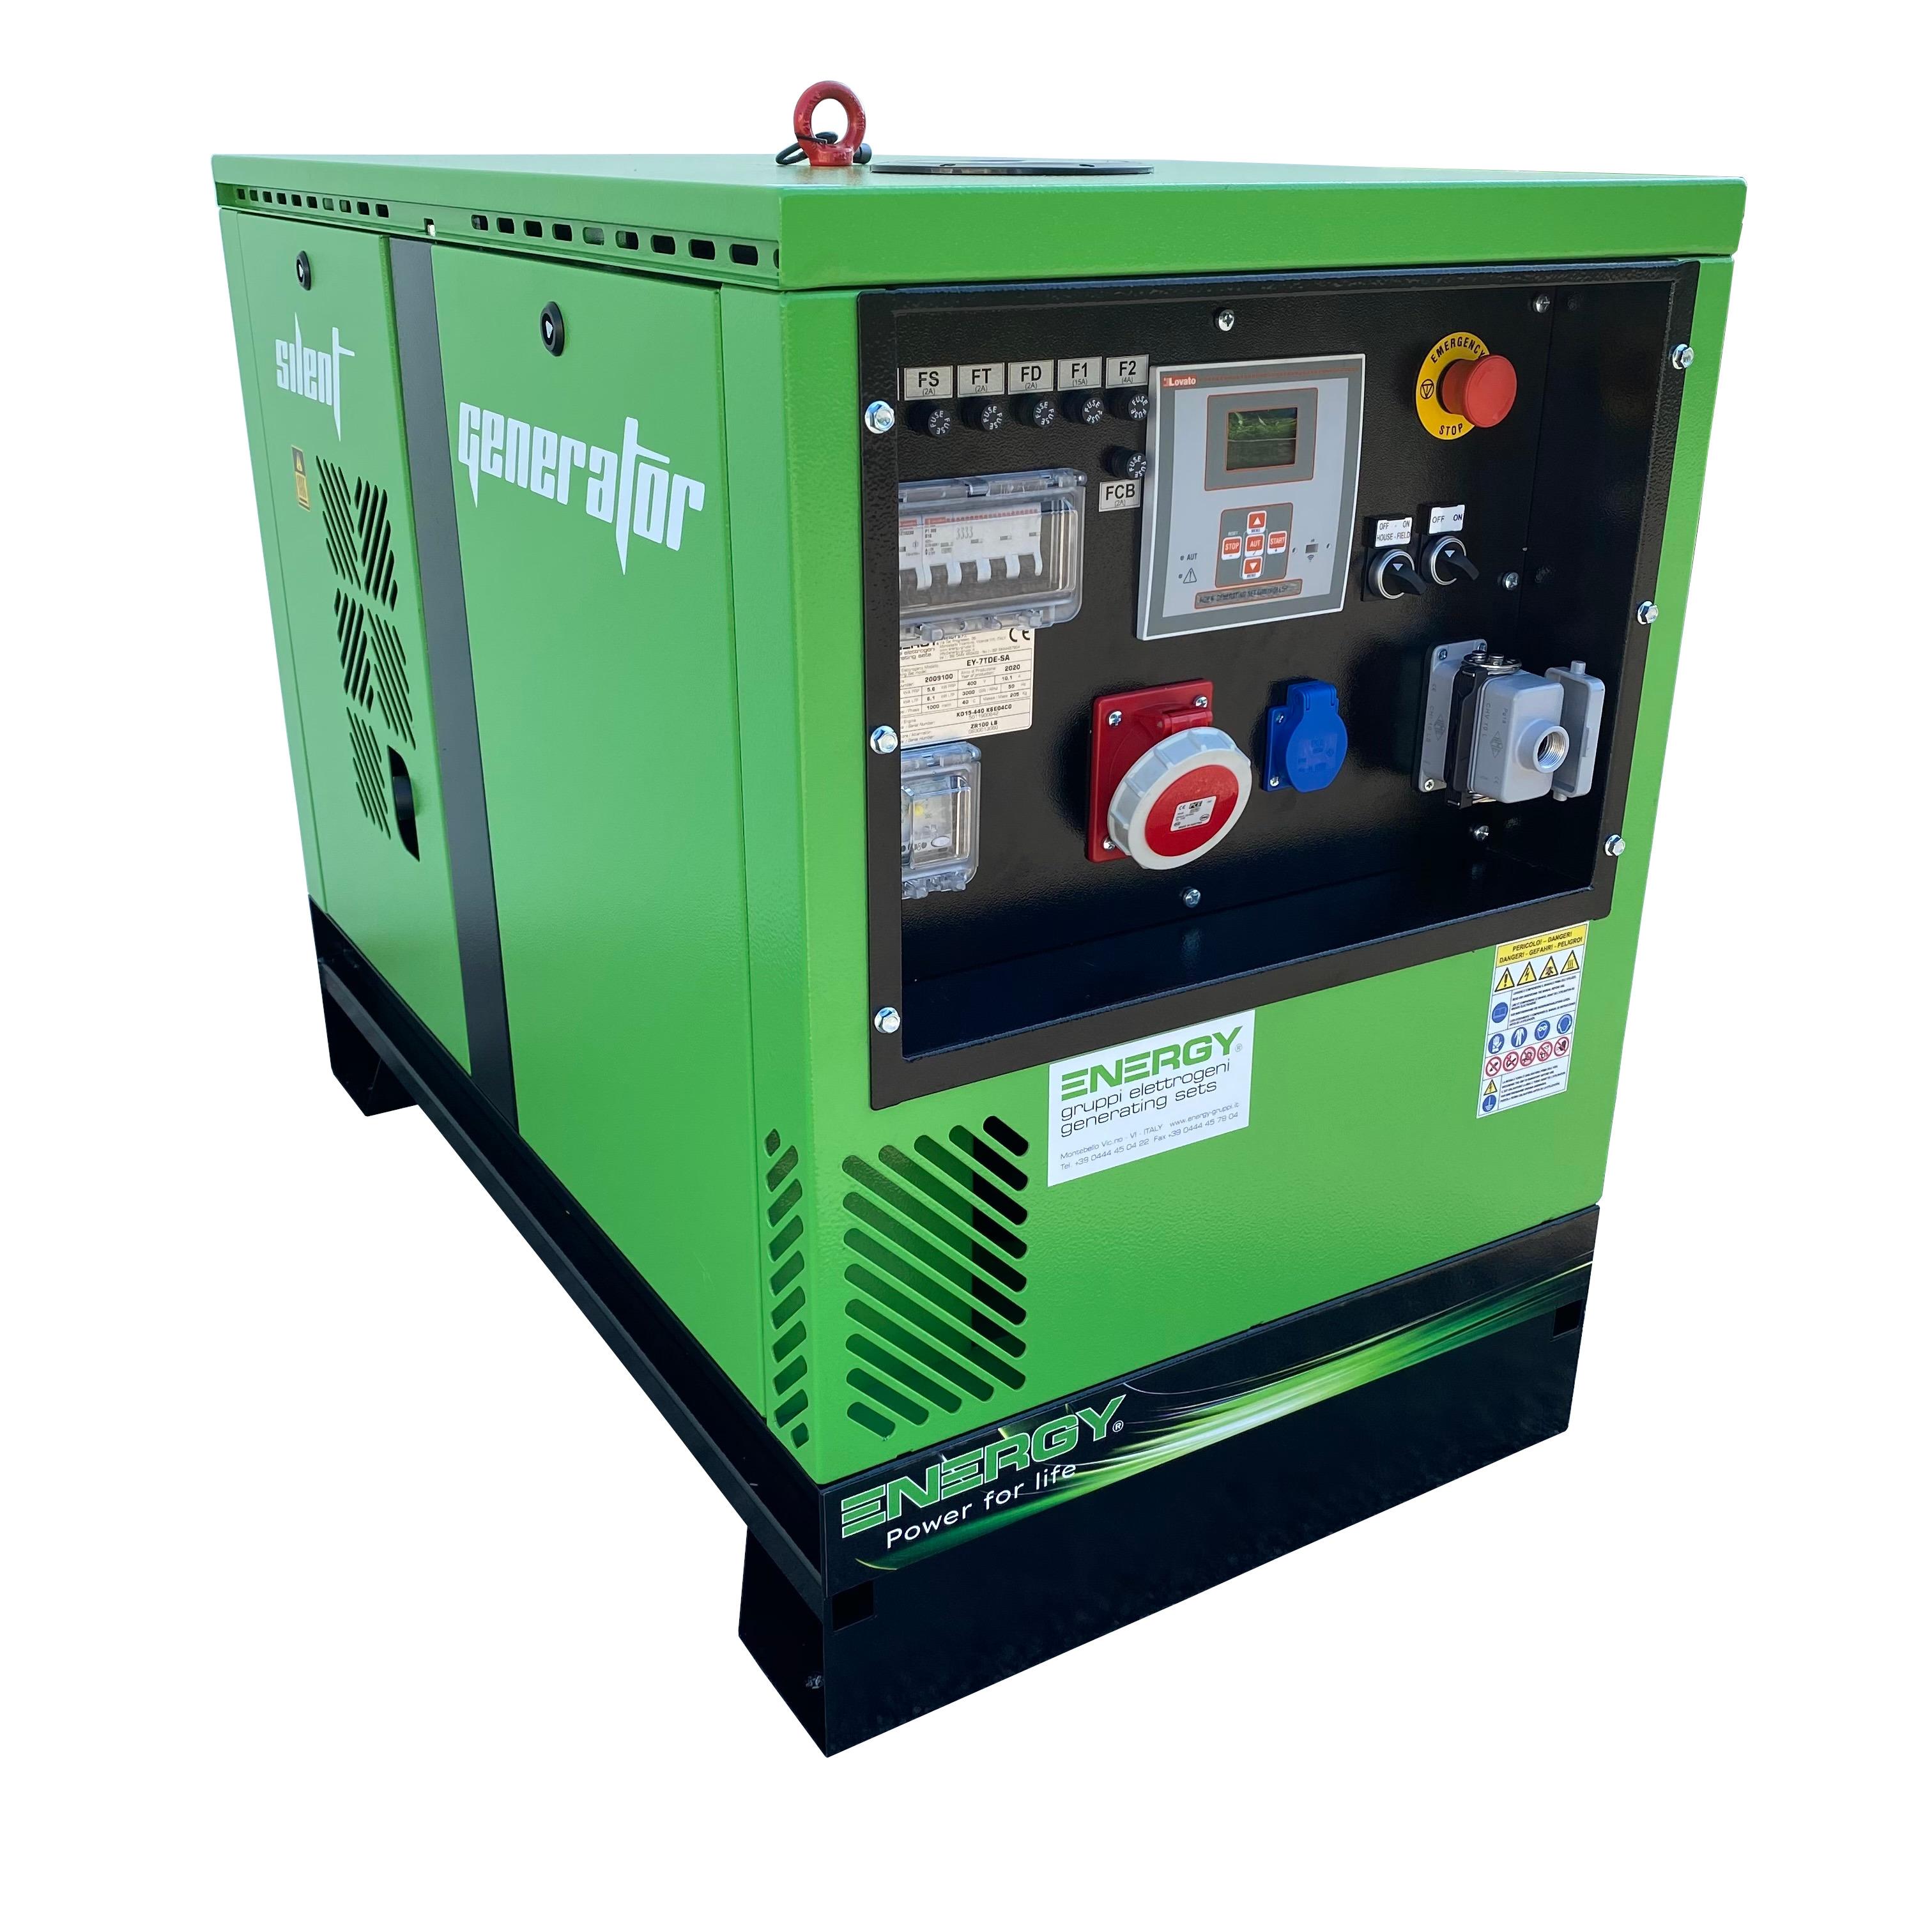 ENERGY Diesel Stromerzeuger 7 kVA 400V ADEY-7TDE-SA Stromaggregat